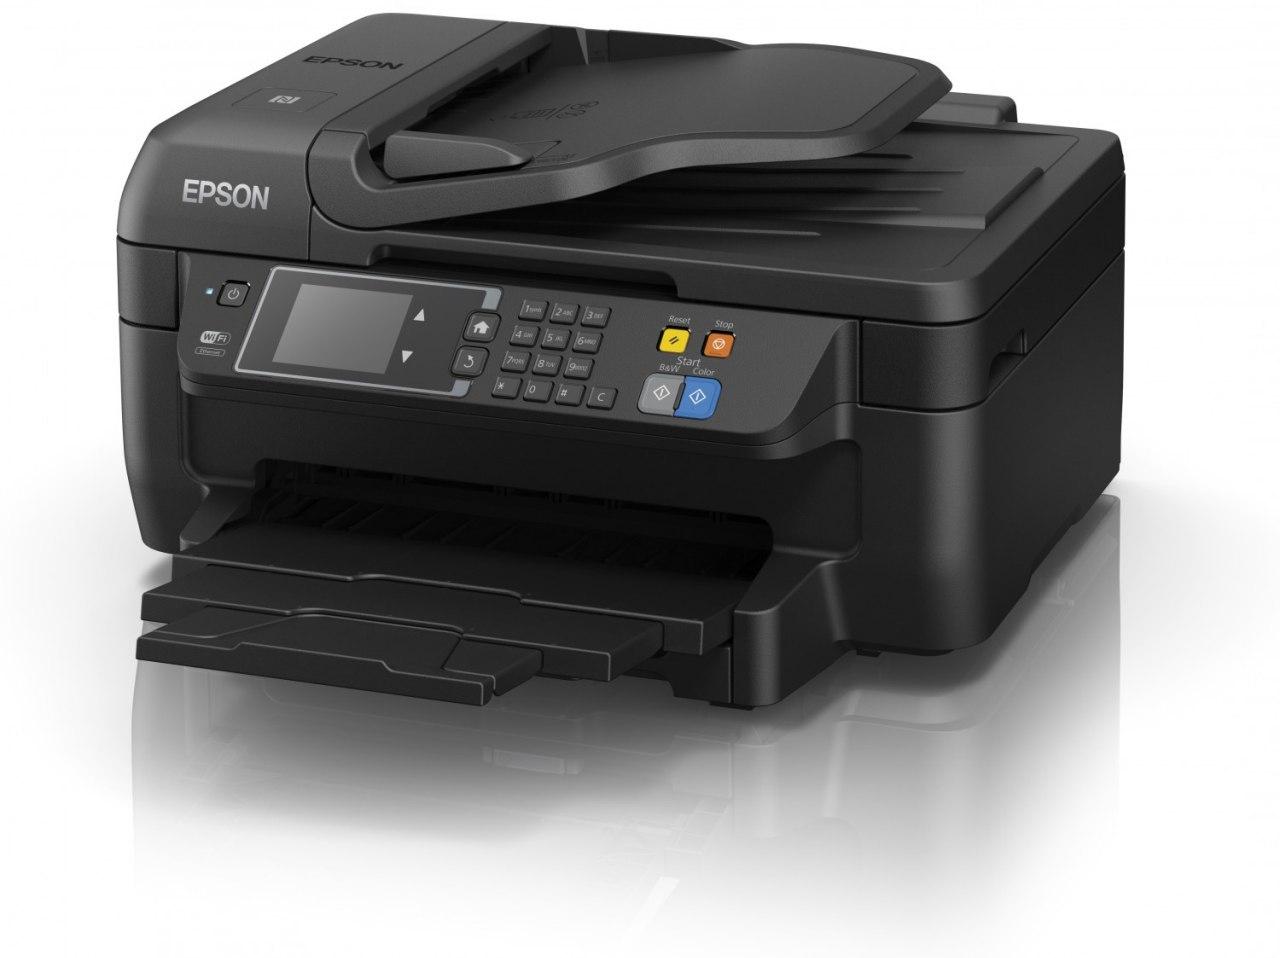 Impresora Epson Multifunción WiFi solo 69€